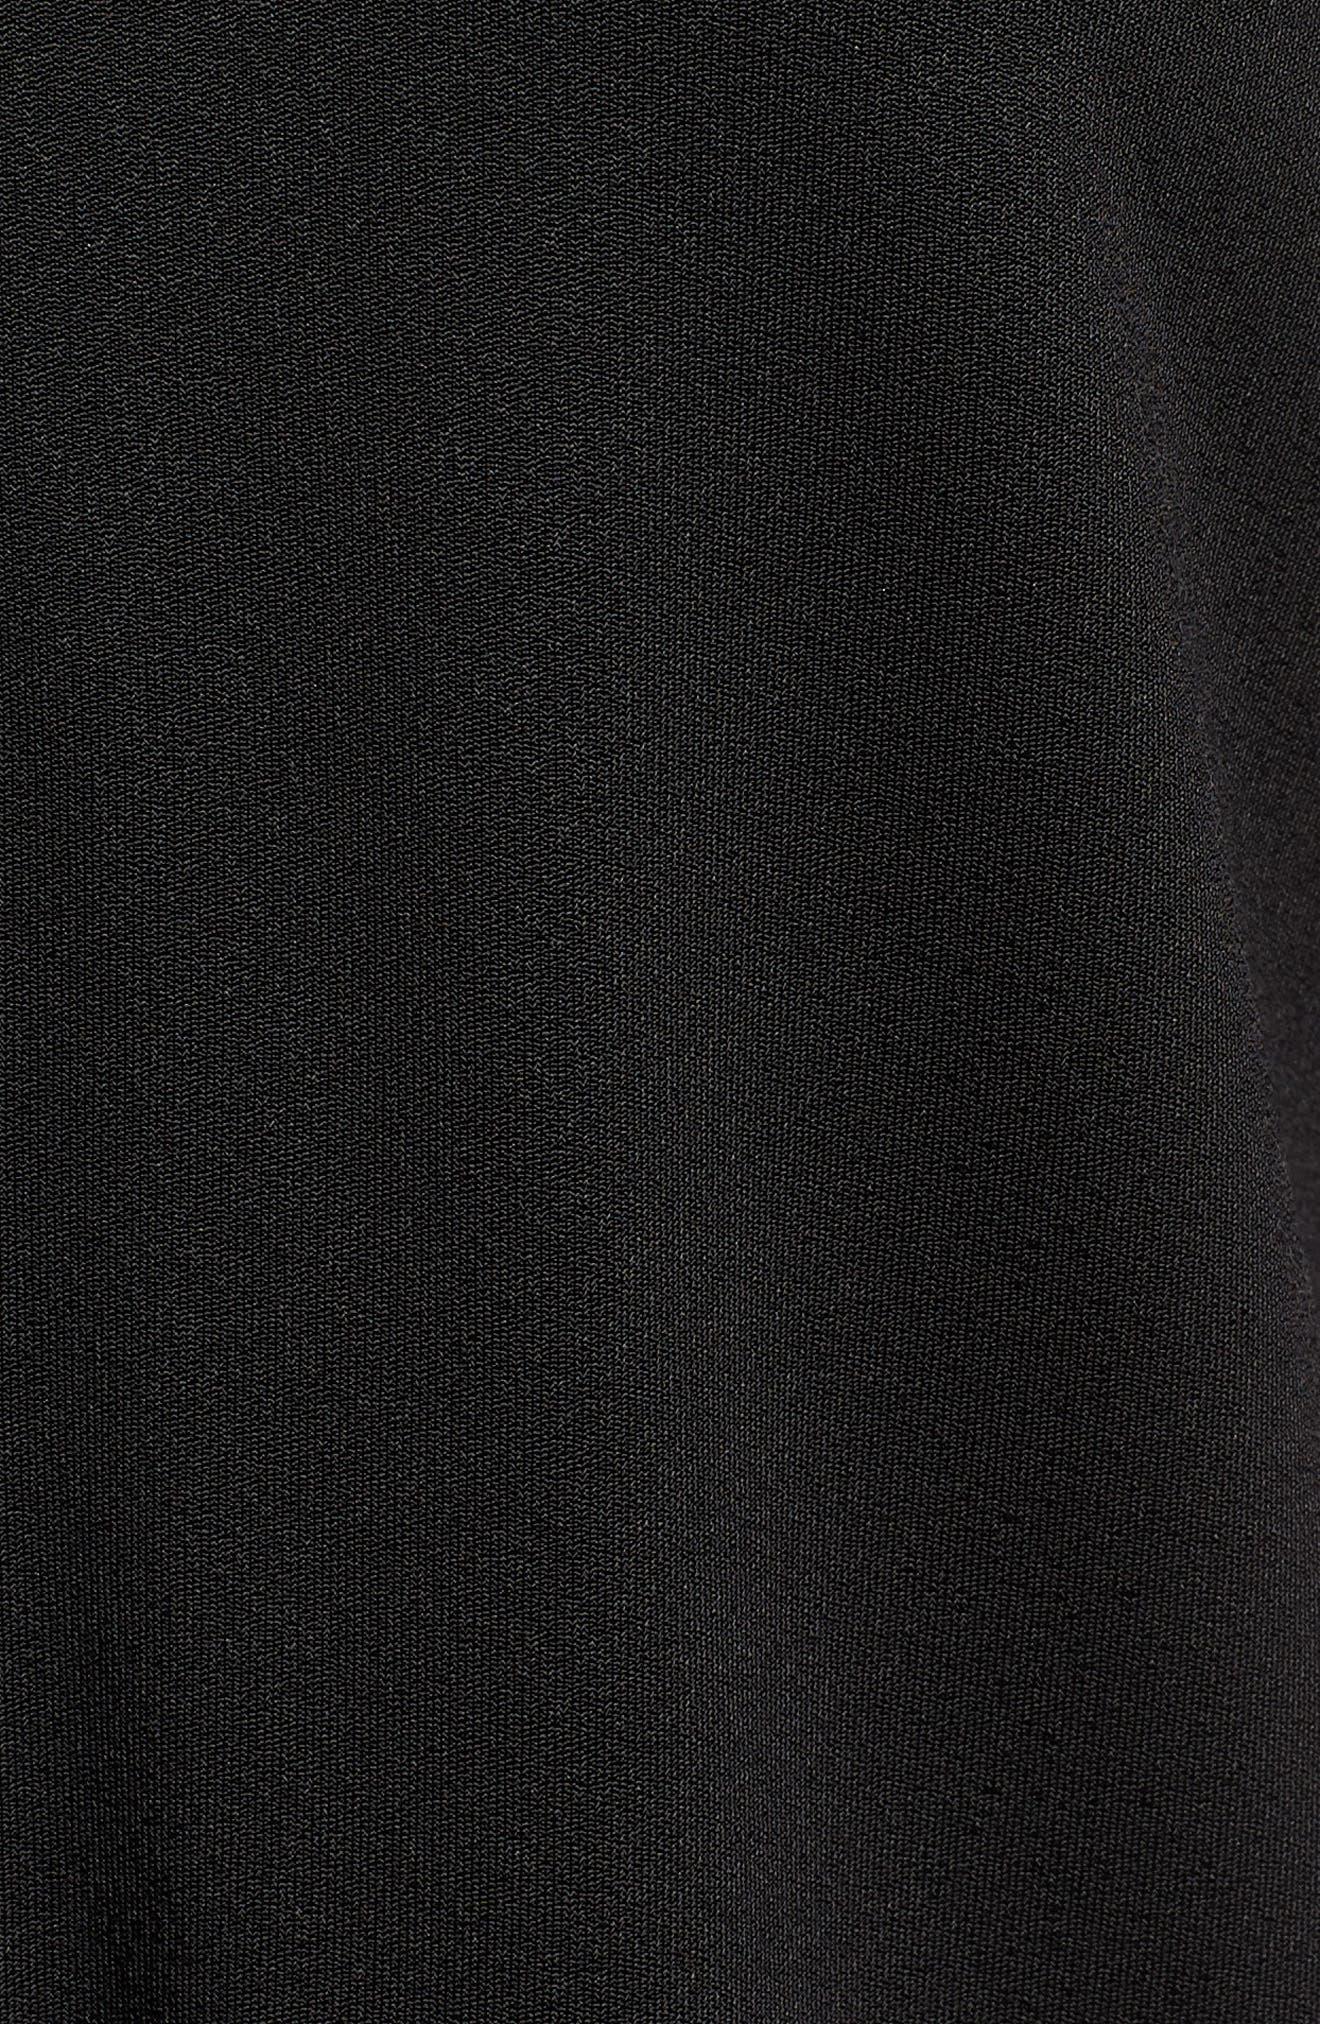 Elenka Top,                             Alternate thumbnail 6, color,                             Black